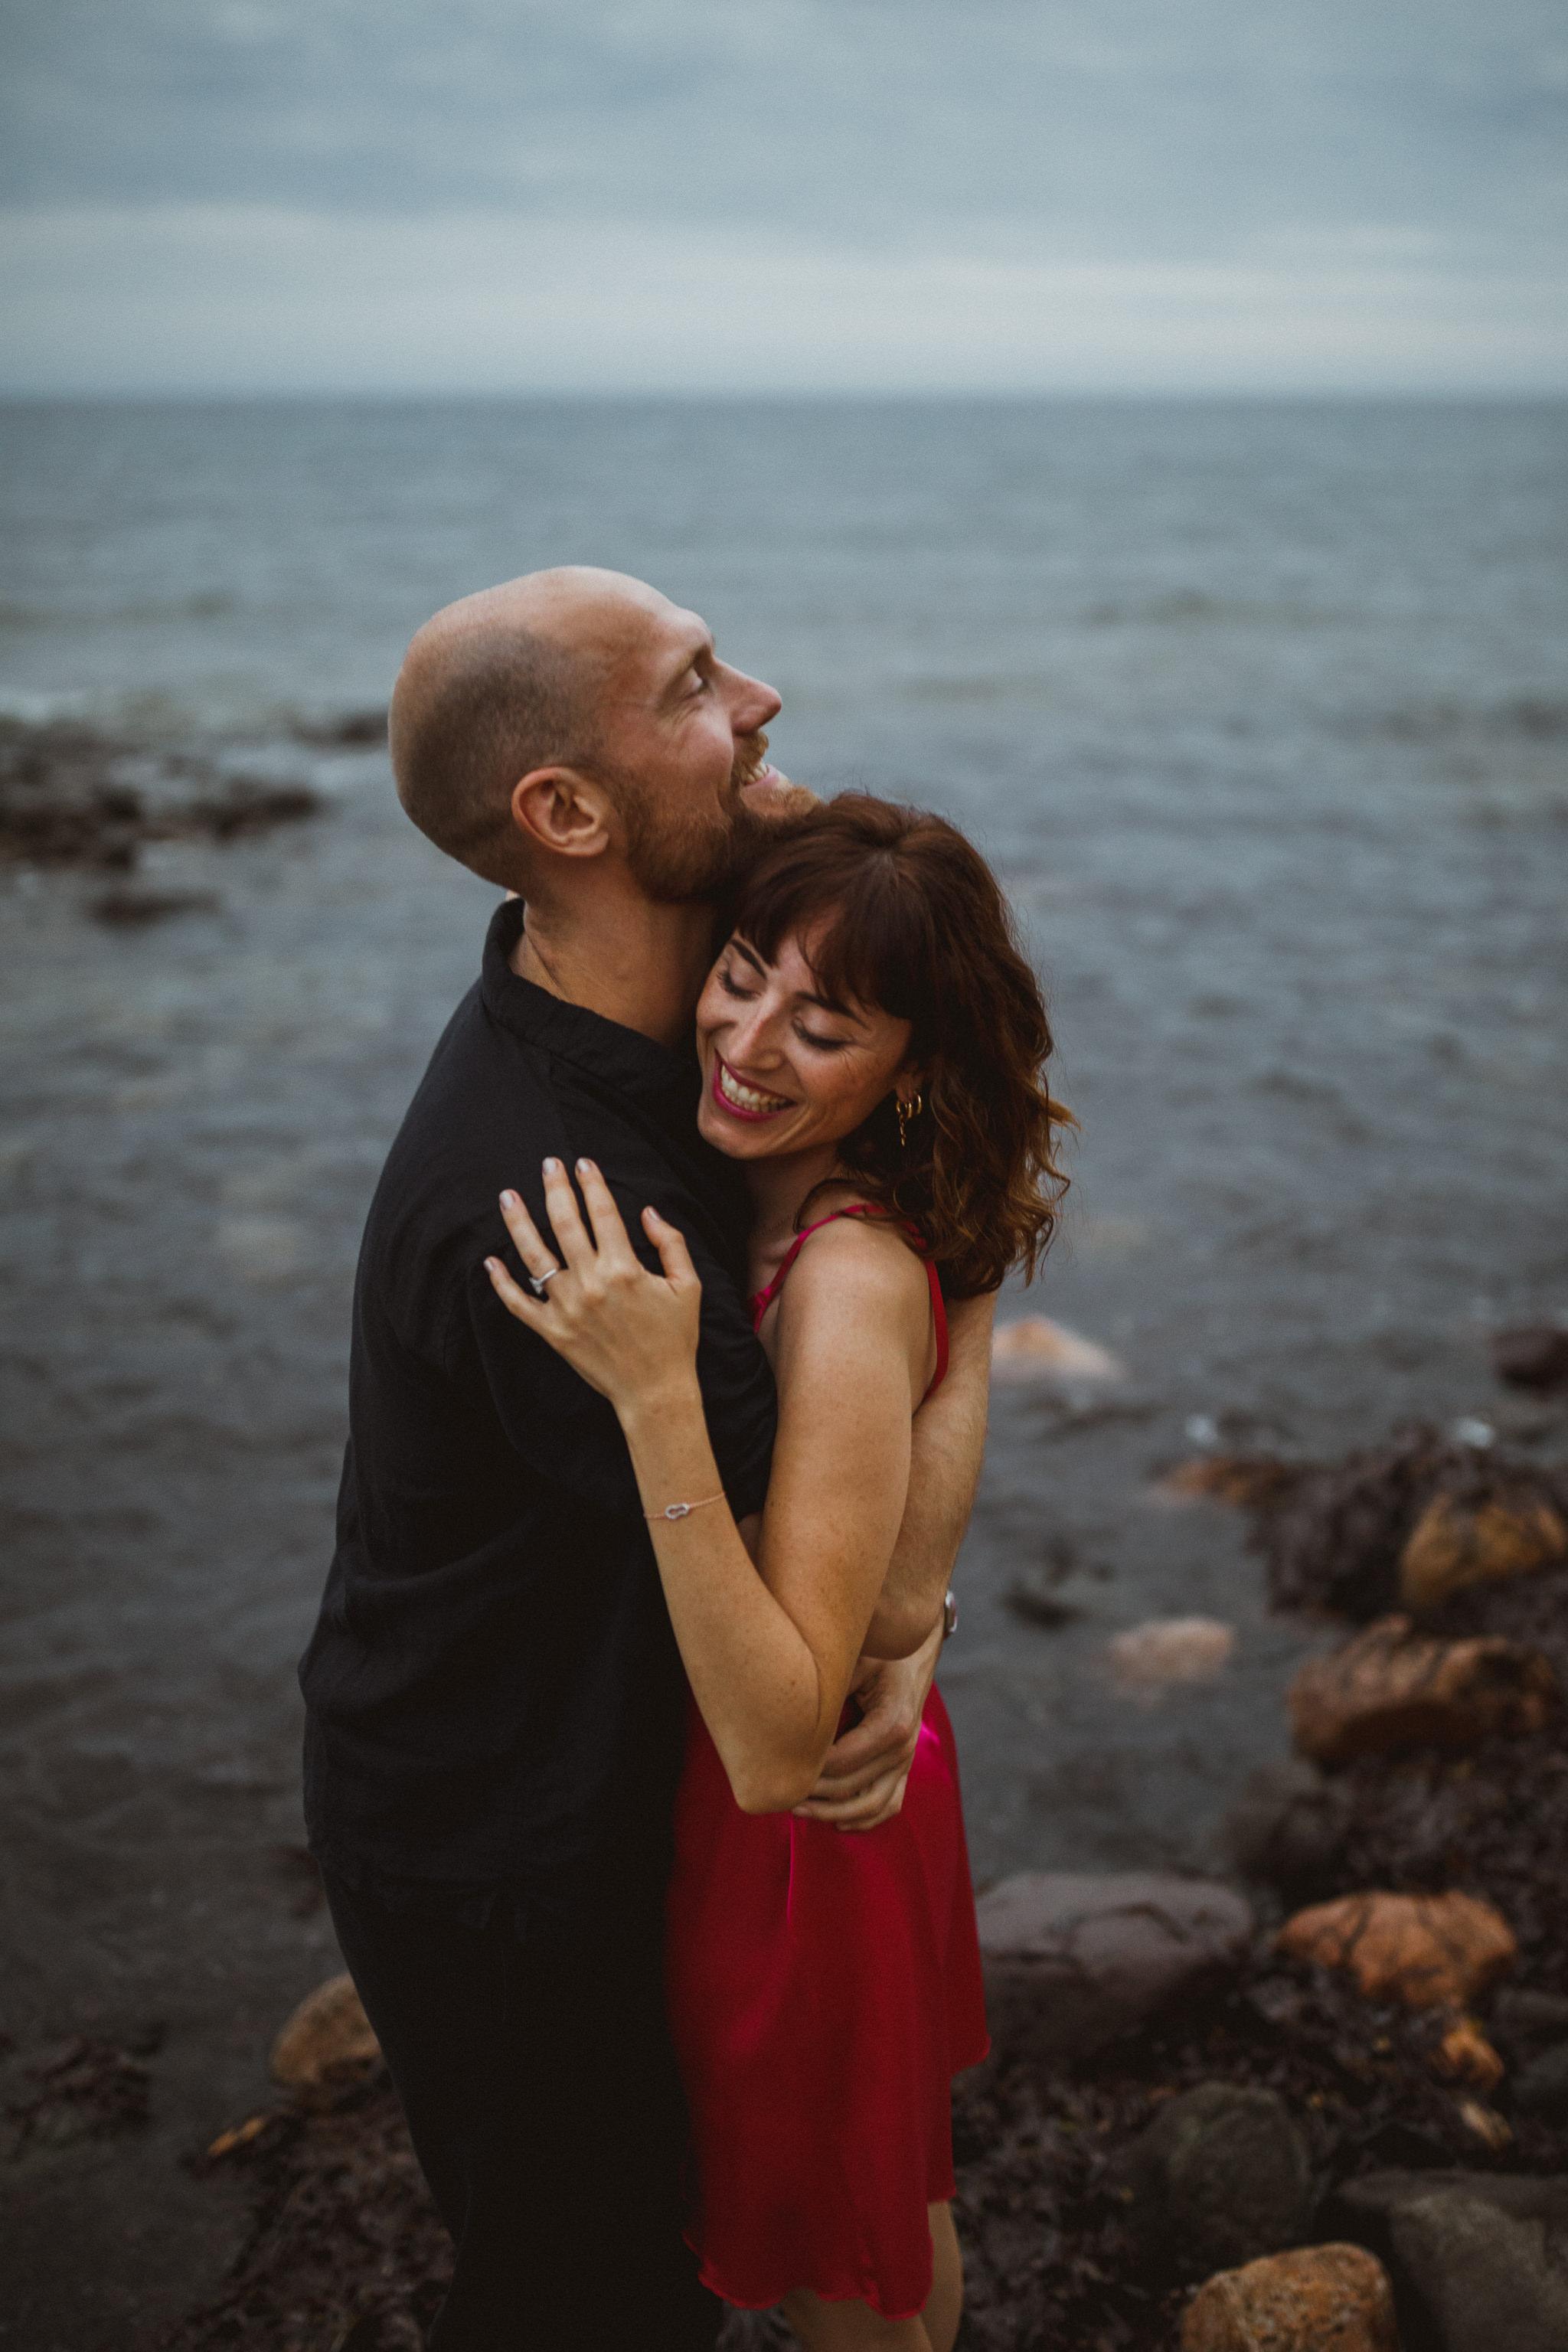 italy wedding photographer and videographer